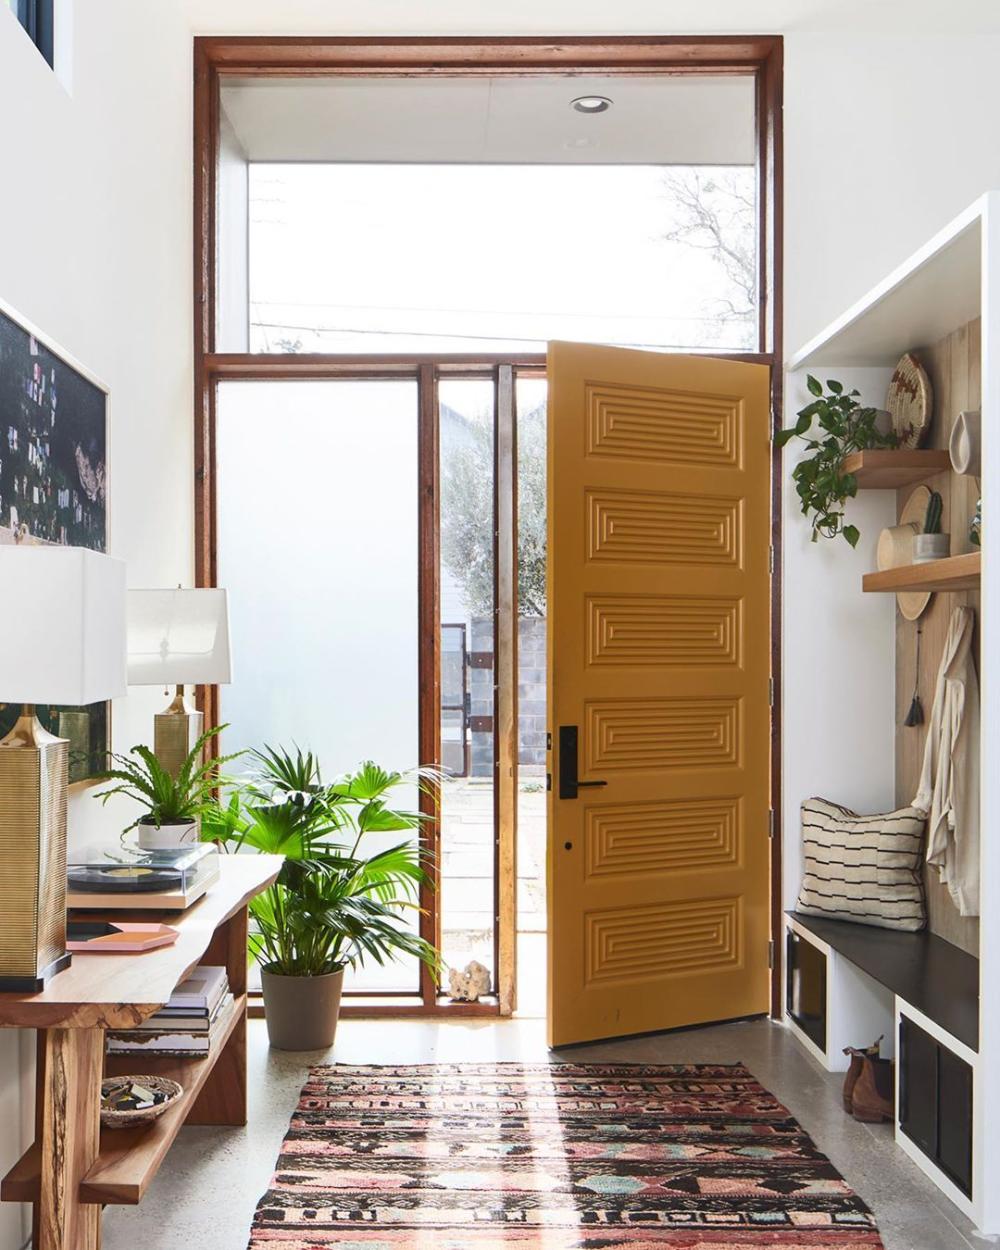 Rachel Beierle Rachelb Design Instagram Photos And Videos In 2020 Home Austin Homes Home Remodeling